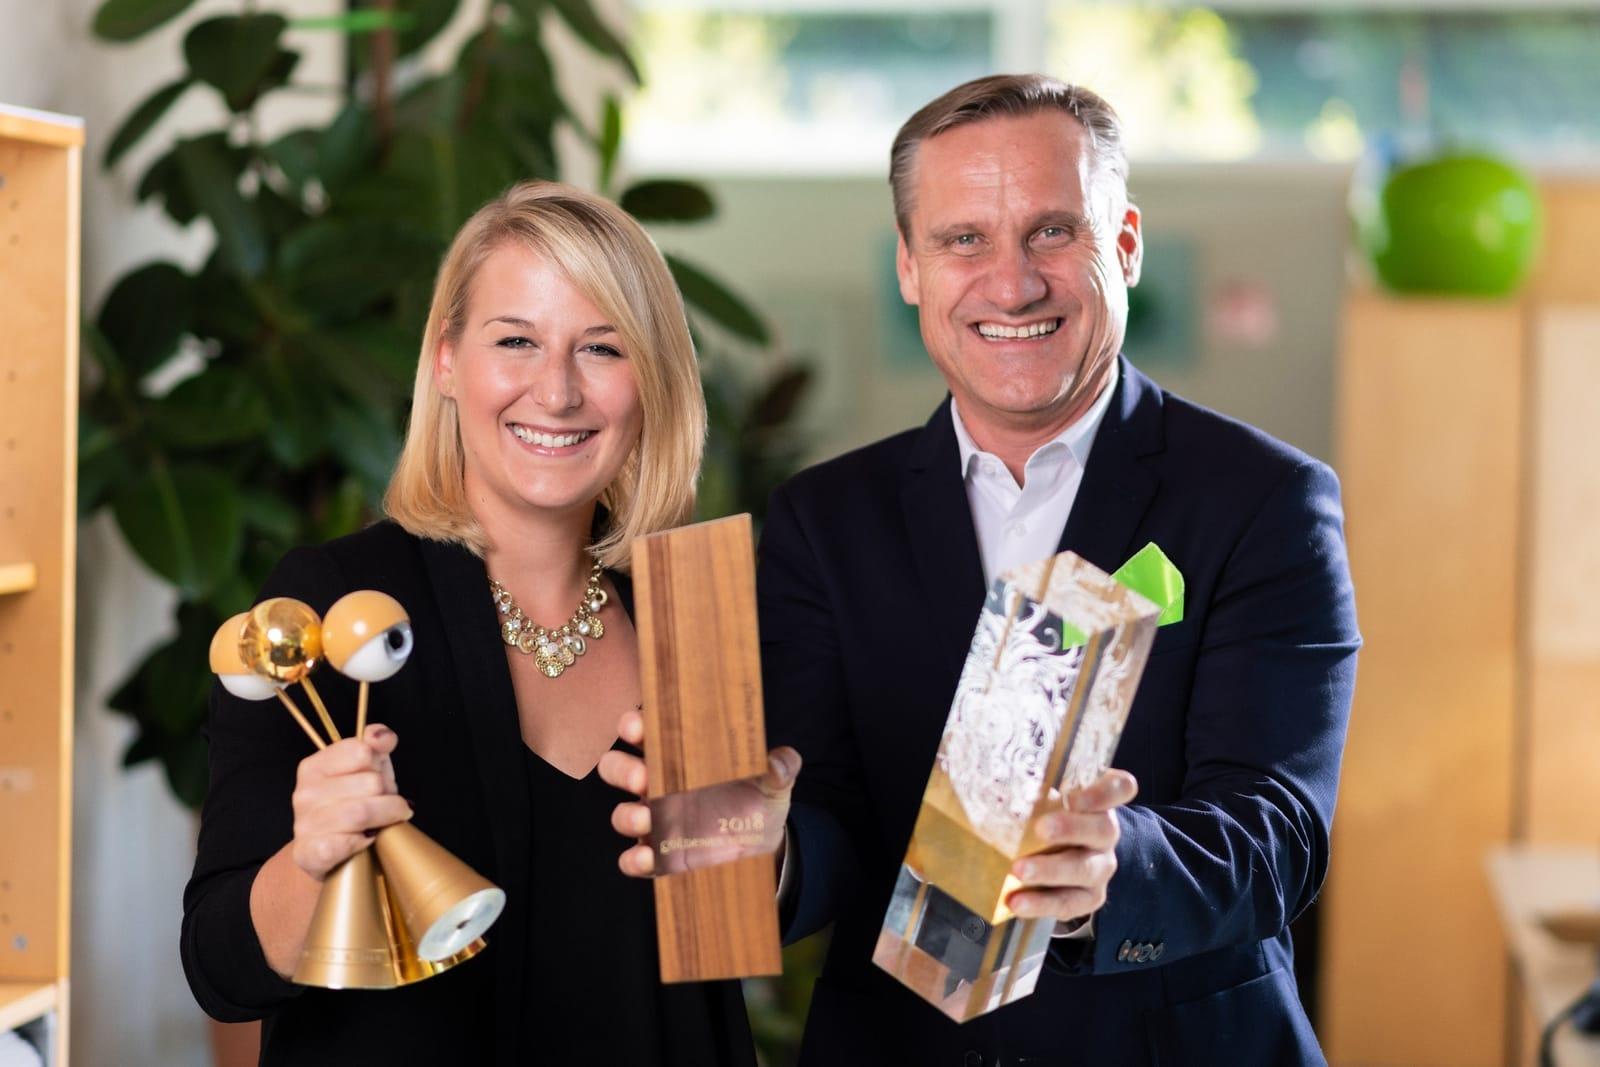 Top Ranking For Putz & Stingl At Austria's Leading Companies